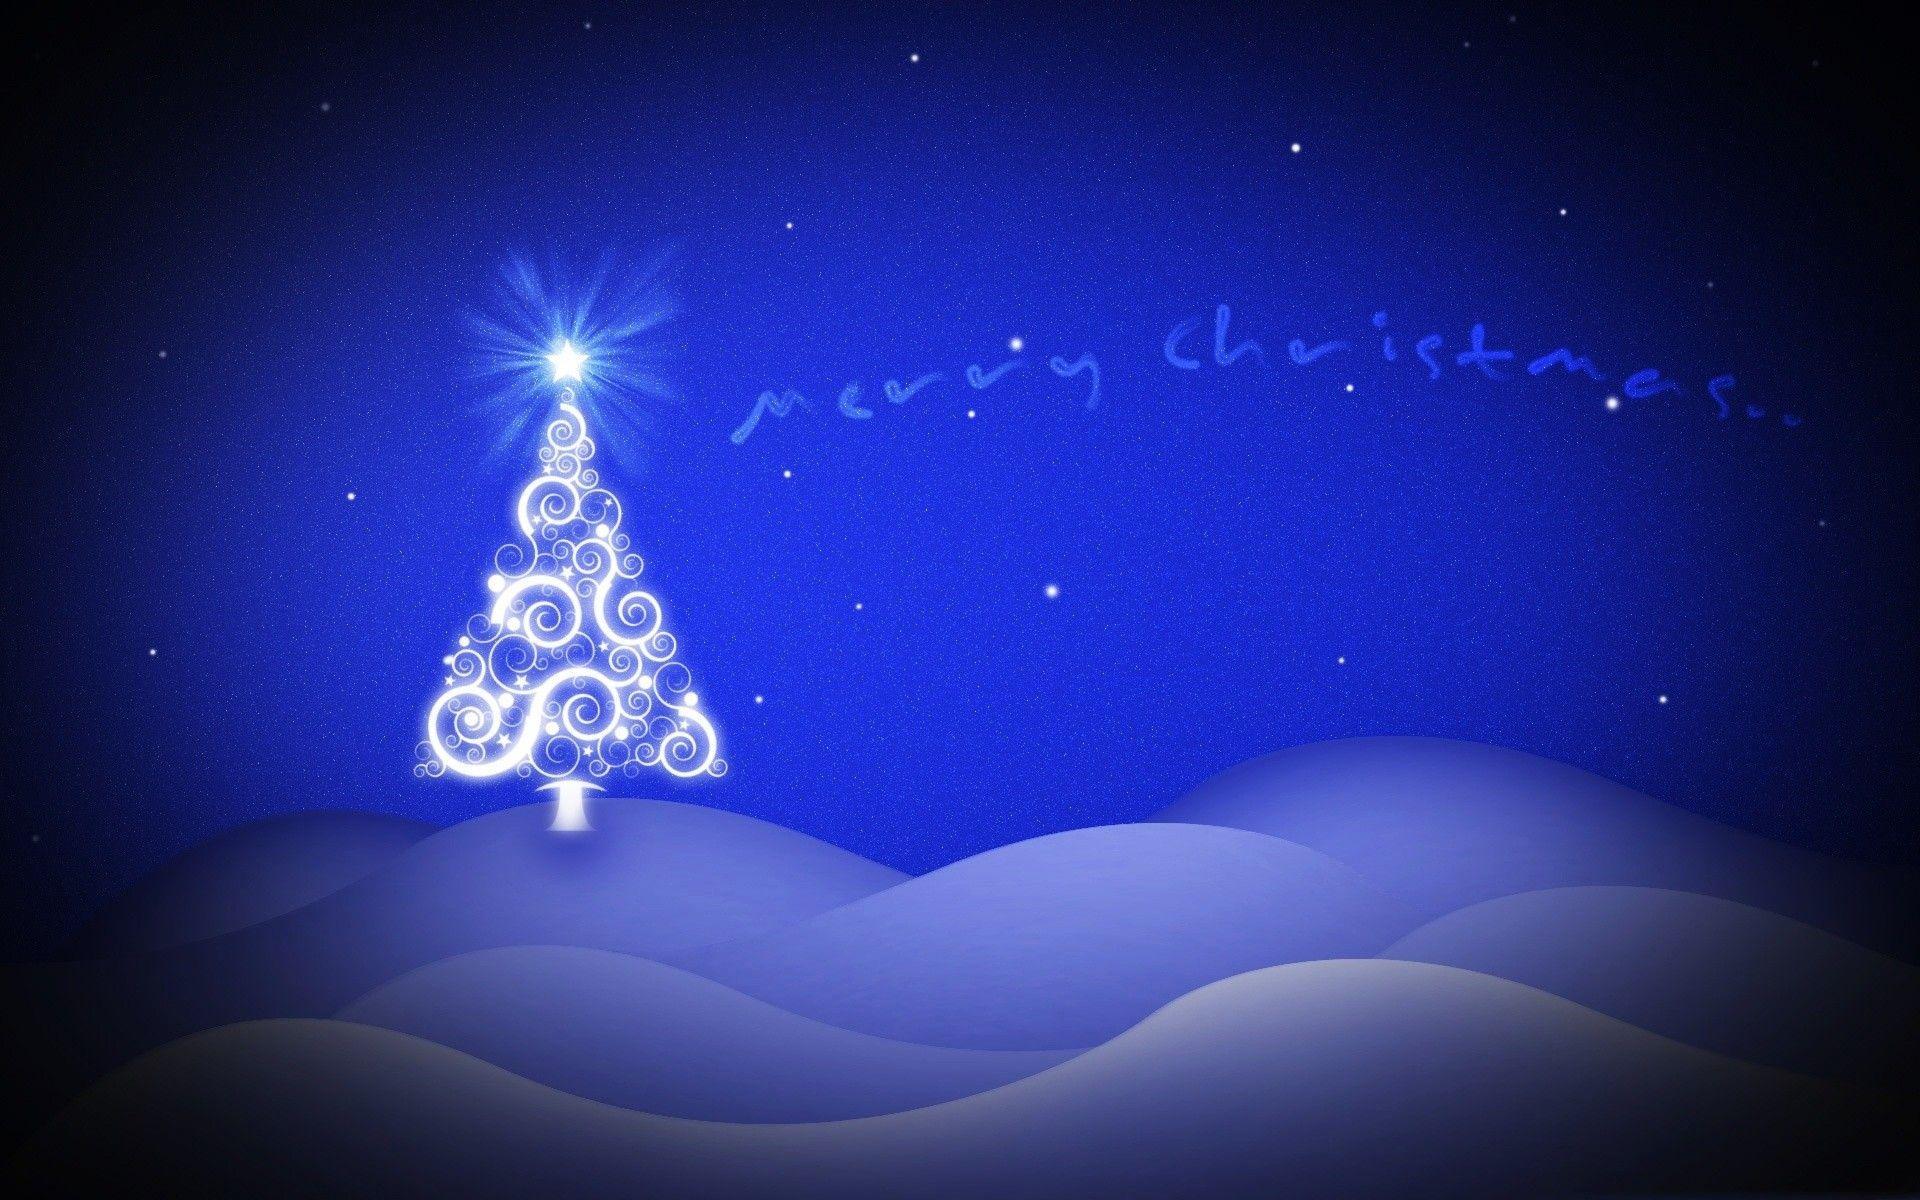 Animated Christmas Wallpapers Top Free Animated Christmas Backgrounds Wallpaperaccess